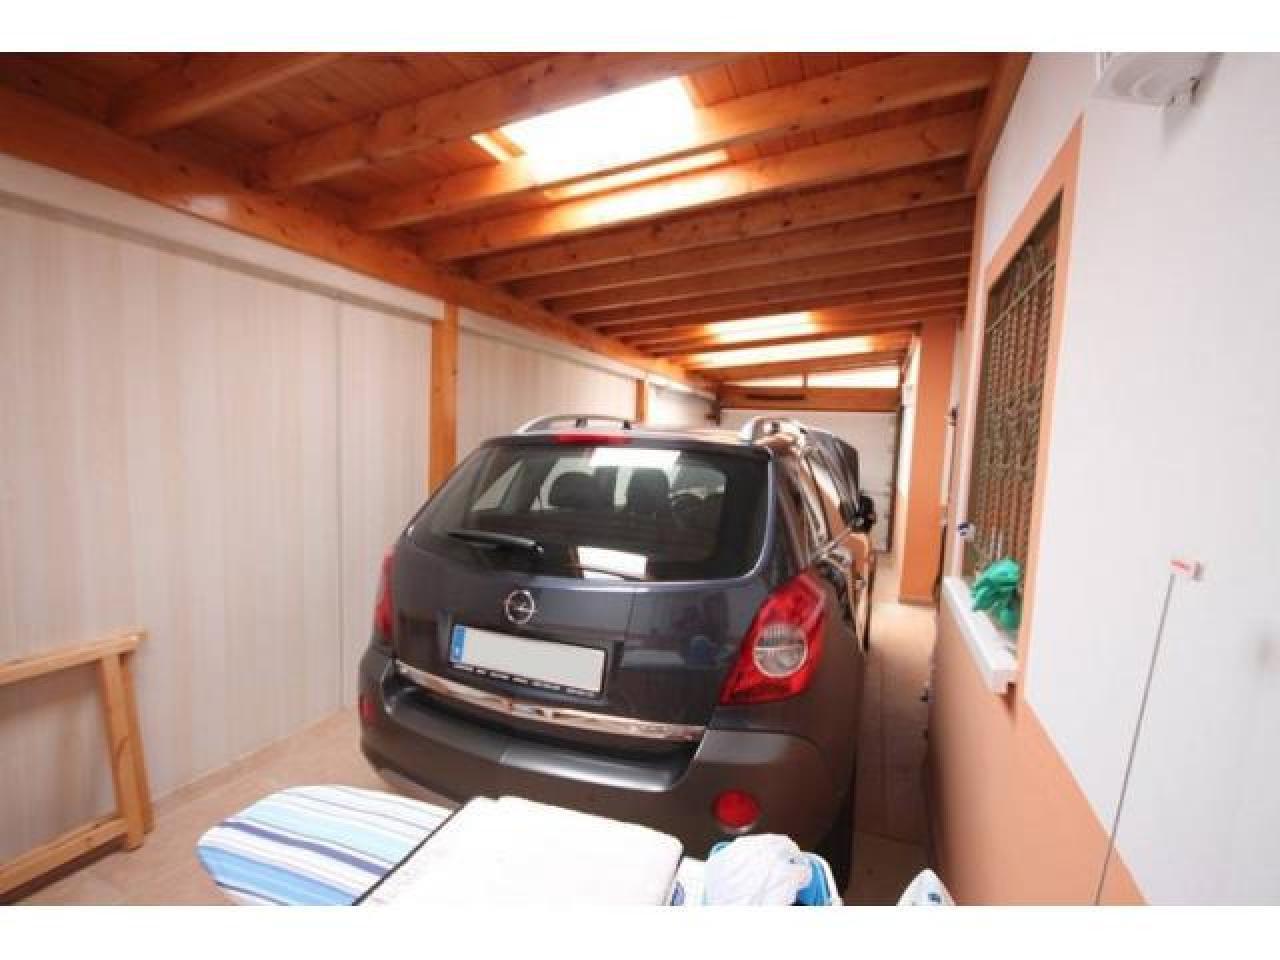 Villa in Tenerife for rent, in Costa Adeje, Madronal de Fanabe - 3